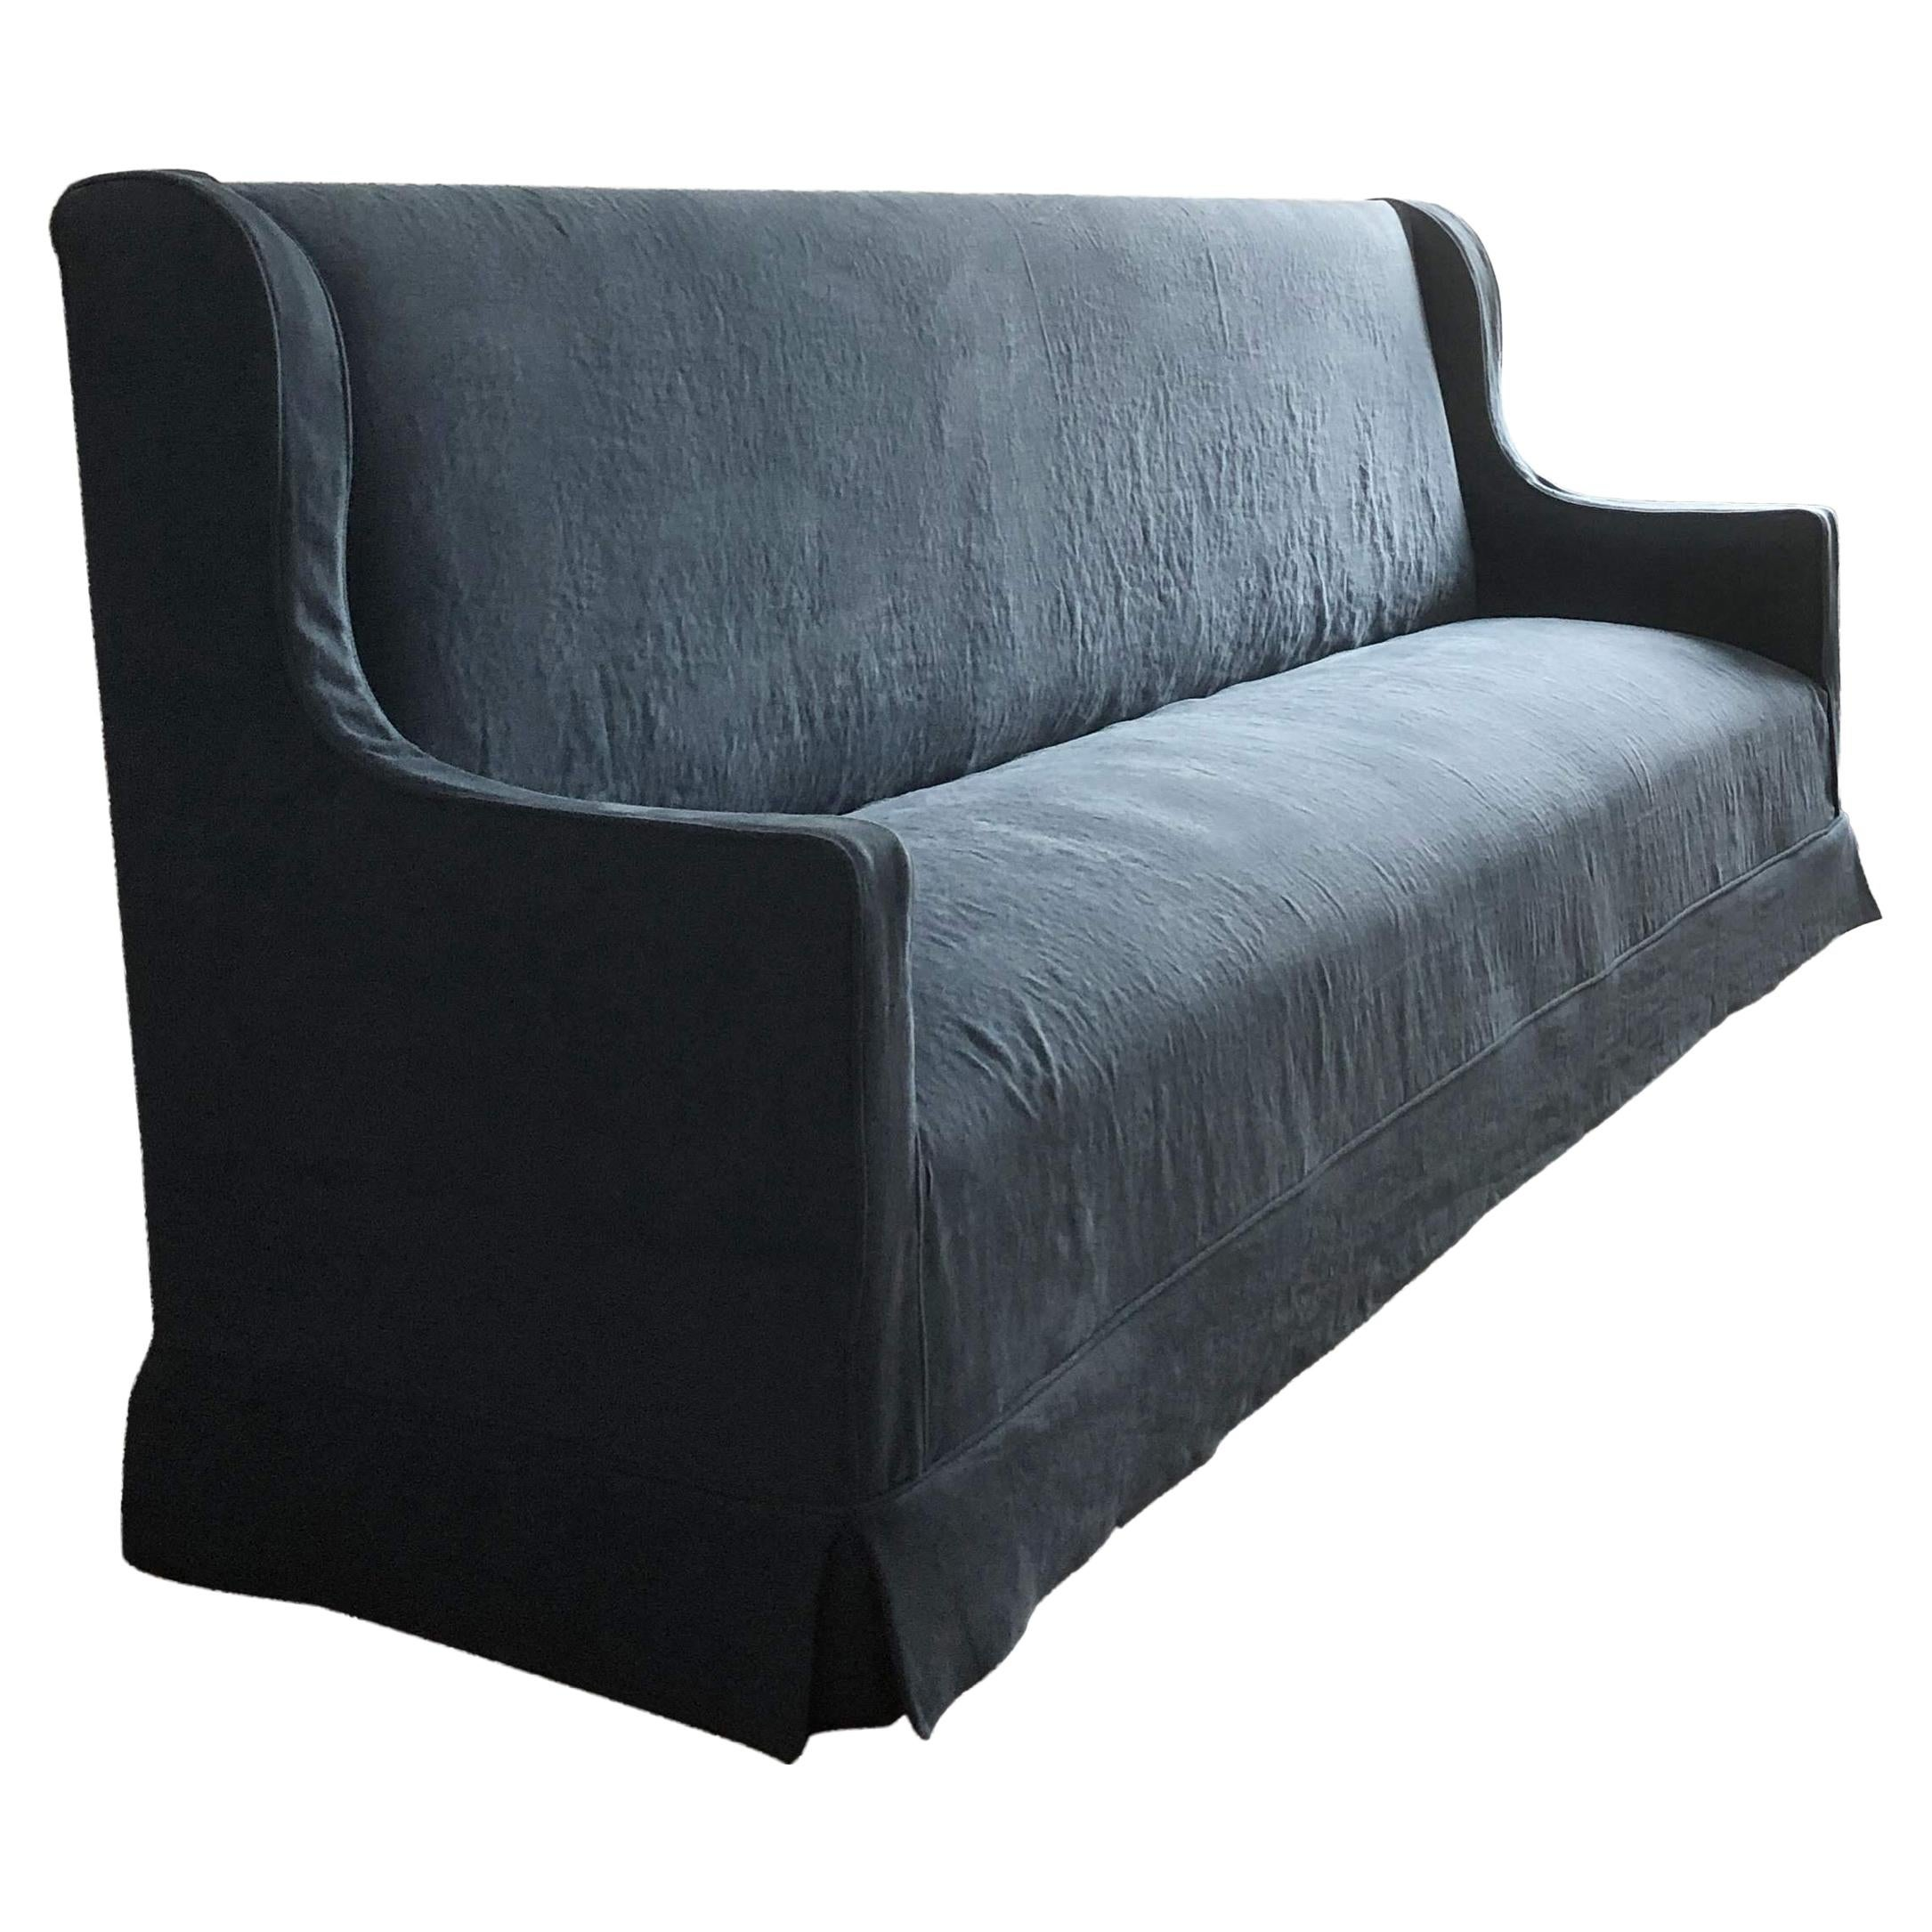 The Cavendish, Bespoke Handmade Belgian Linen Sofa